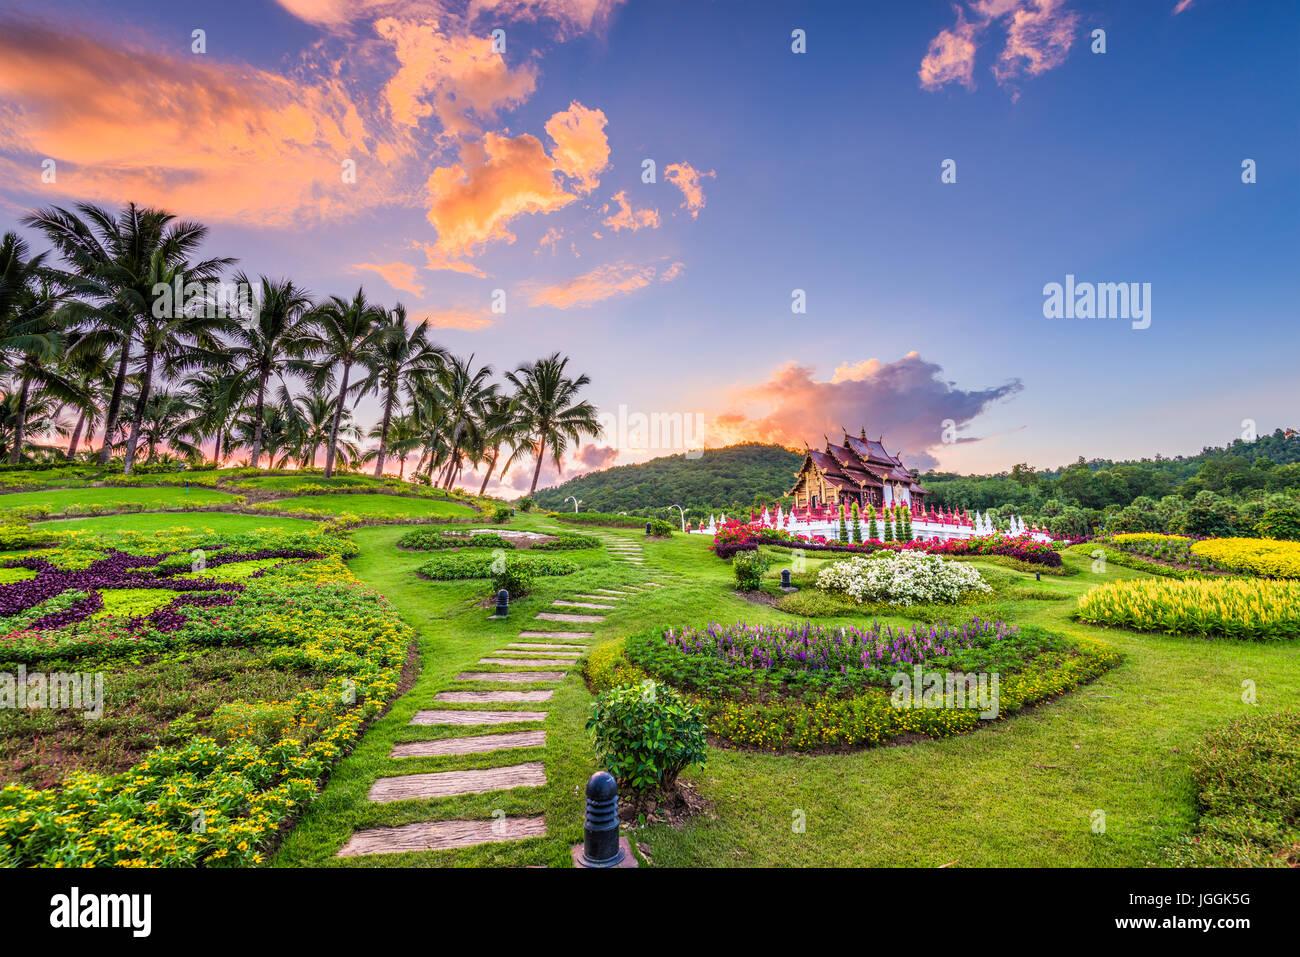 Chiang Mai, Thailand im Royal Flora Ratchaphruek Park. Stockbild